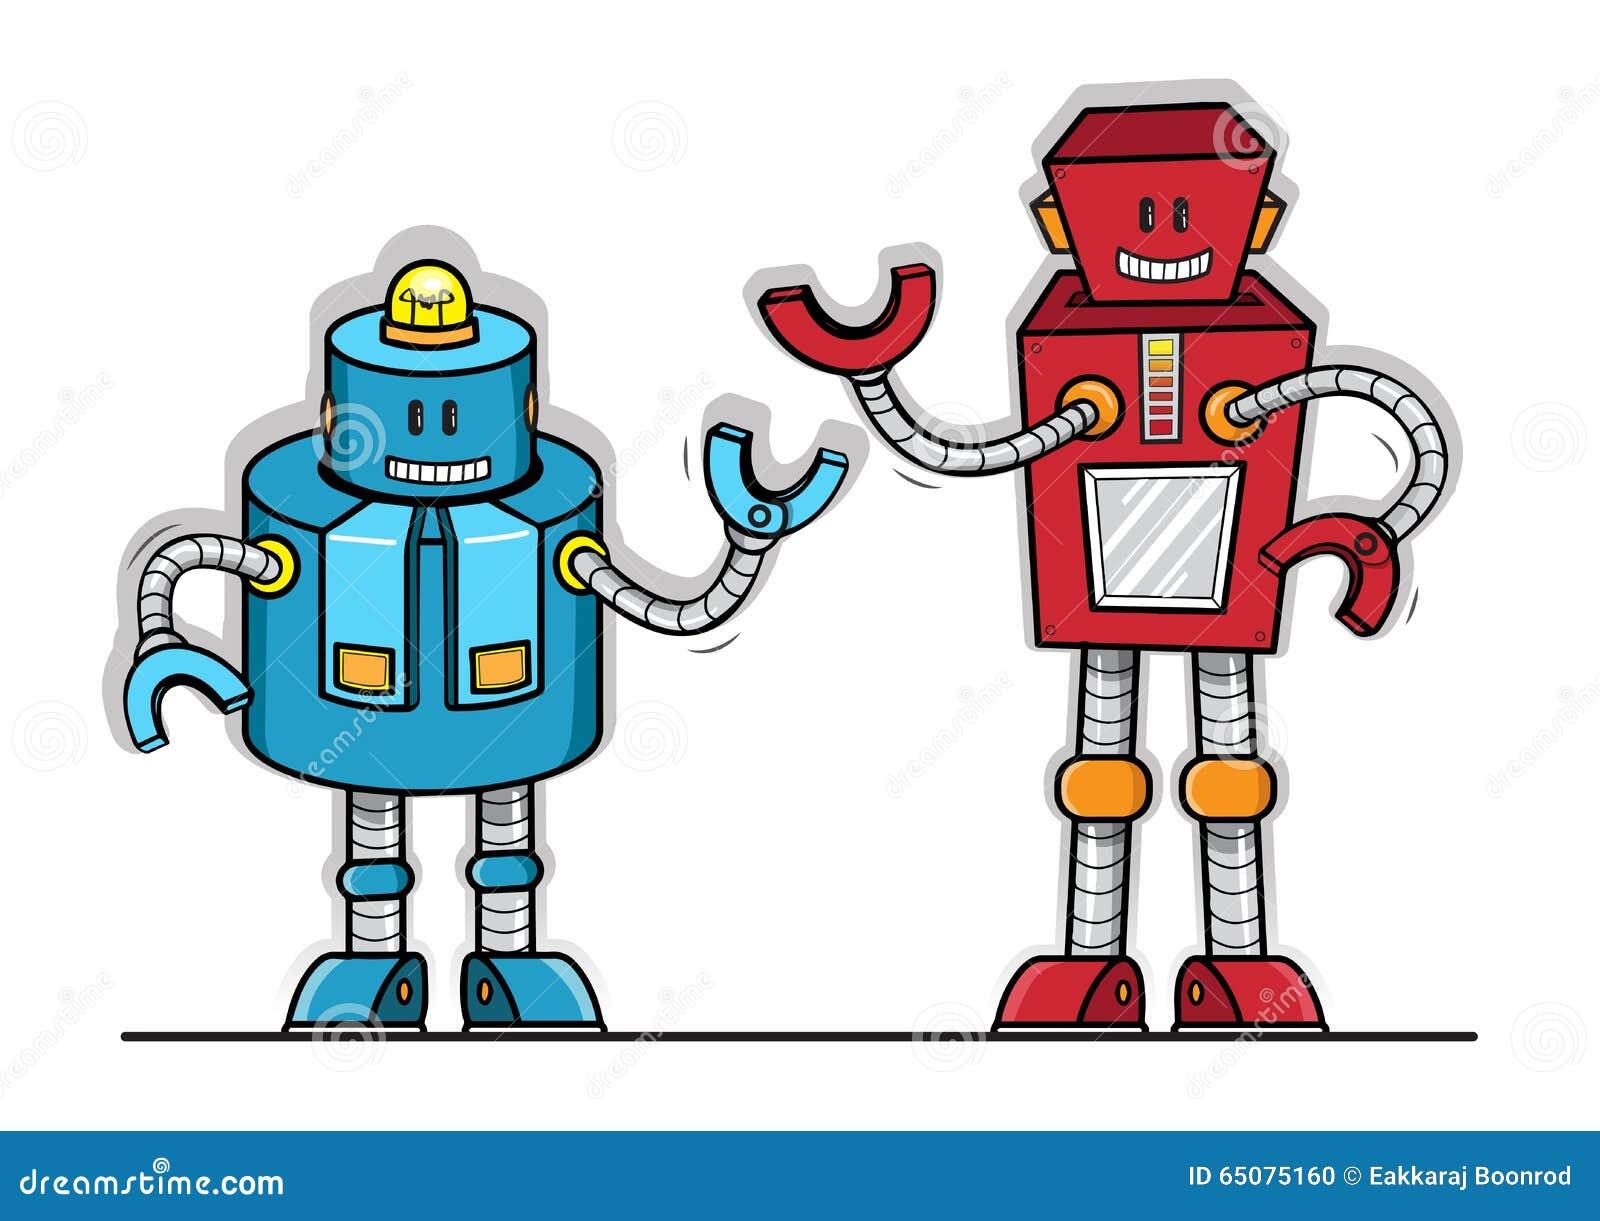 Cartoon Robot Toy : Robot vector toy model stock image of machine